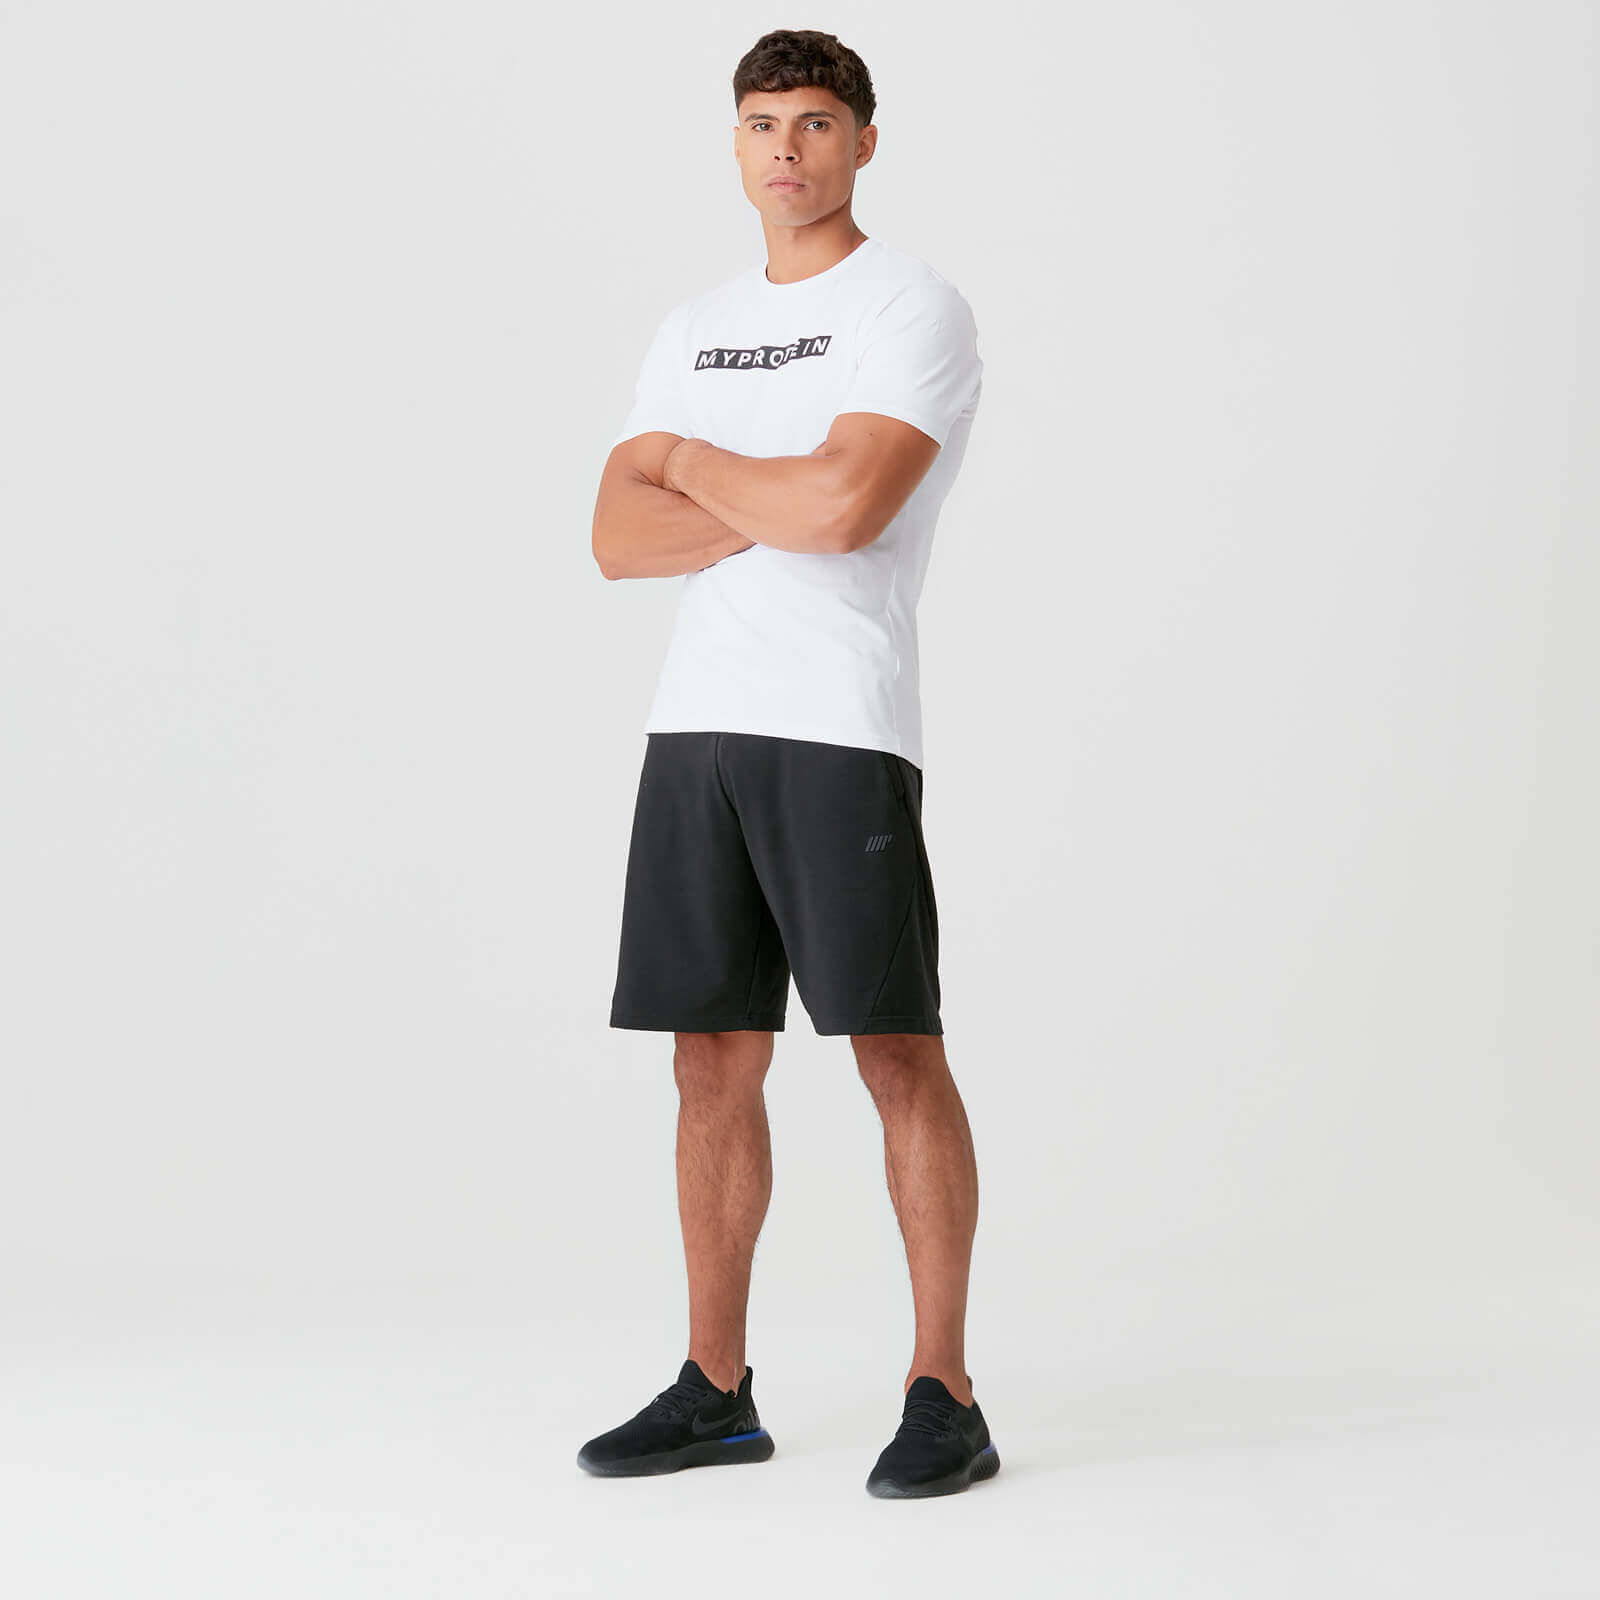 MP Mens The Original T-Shirt - White - L